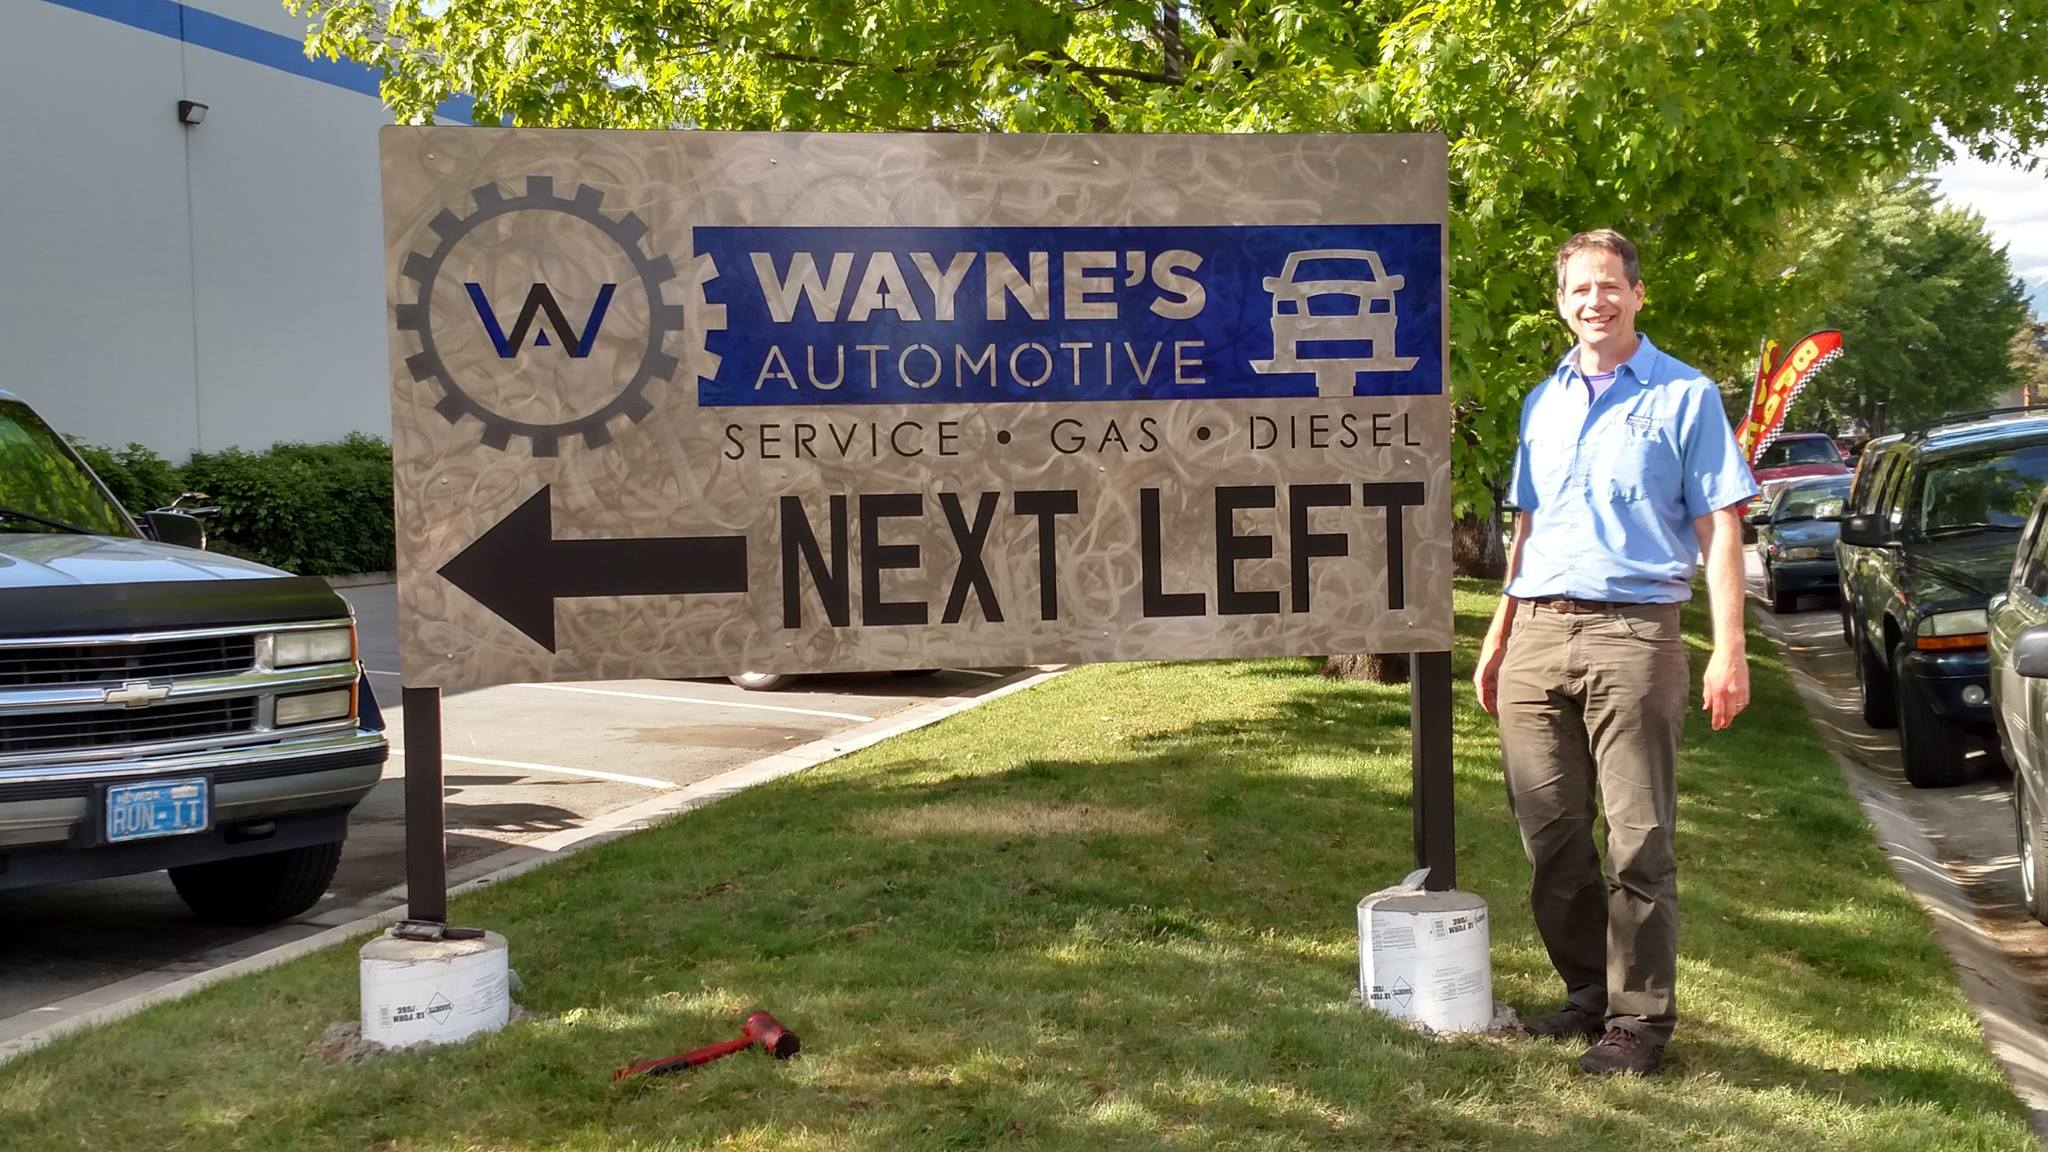 Wayne's Automotive